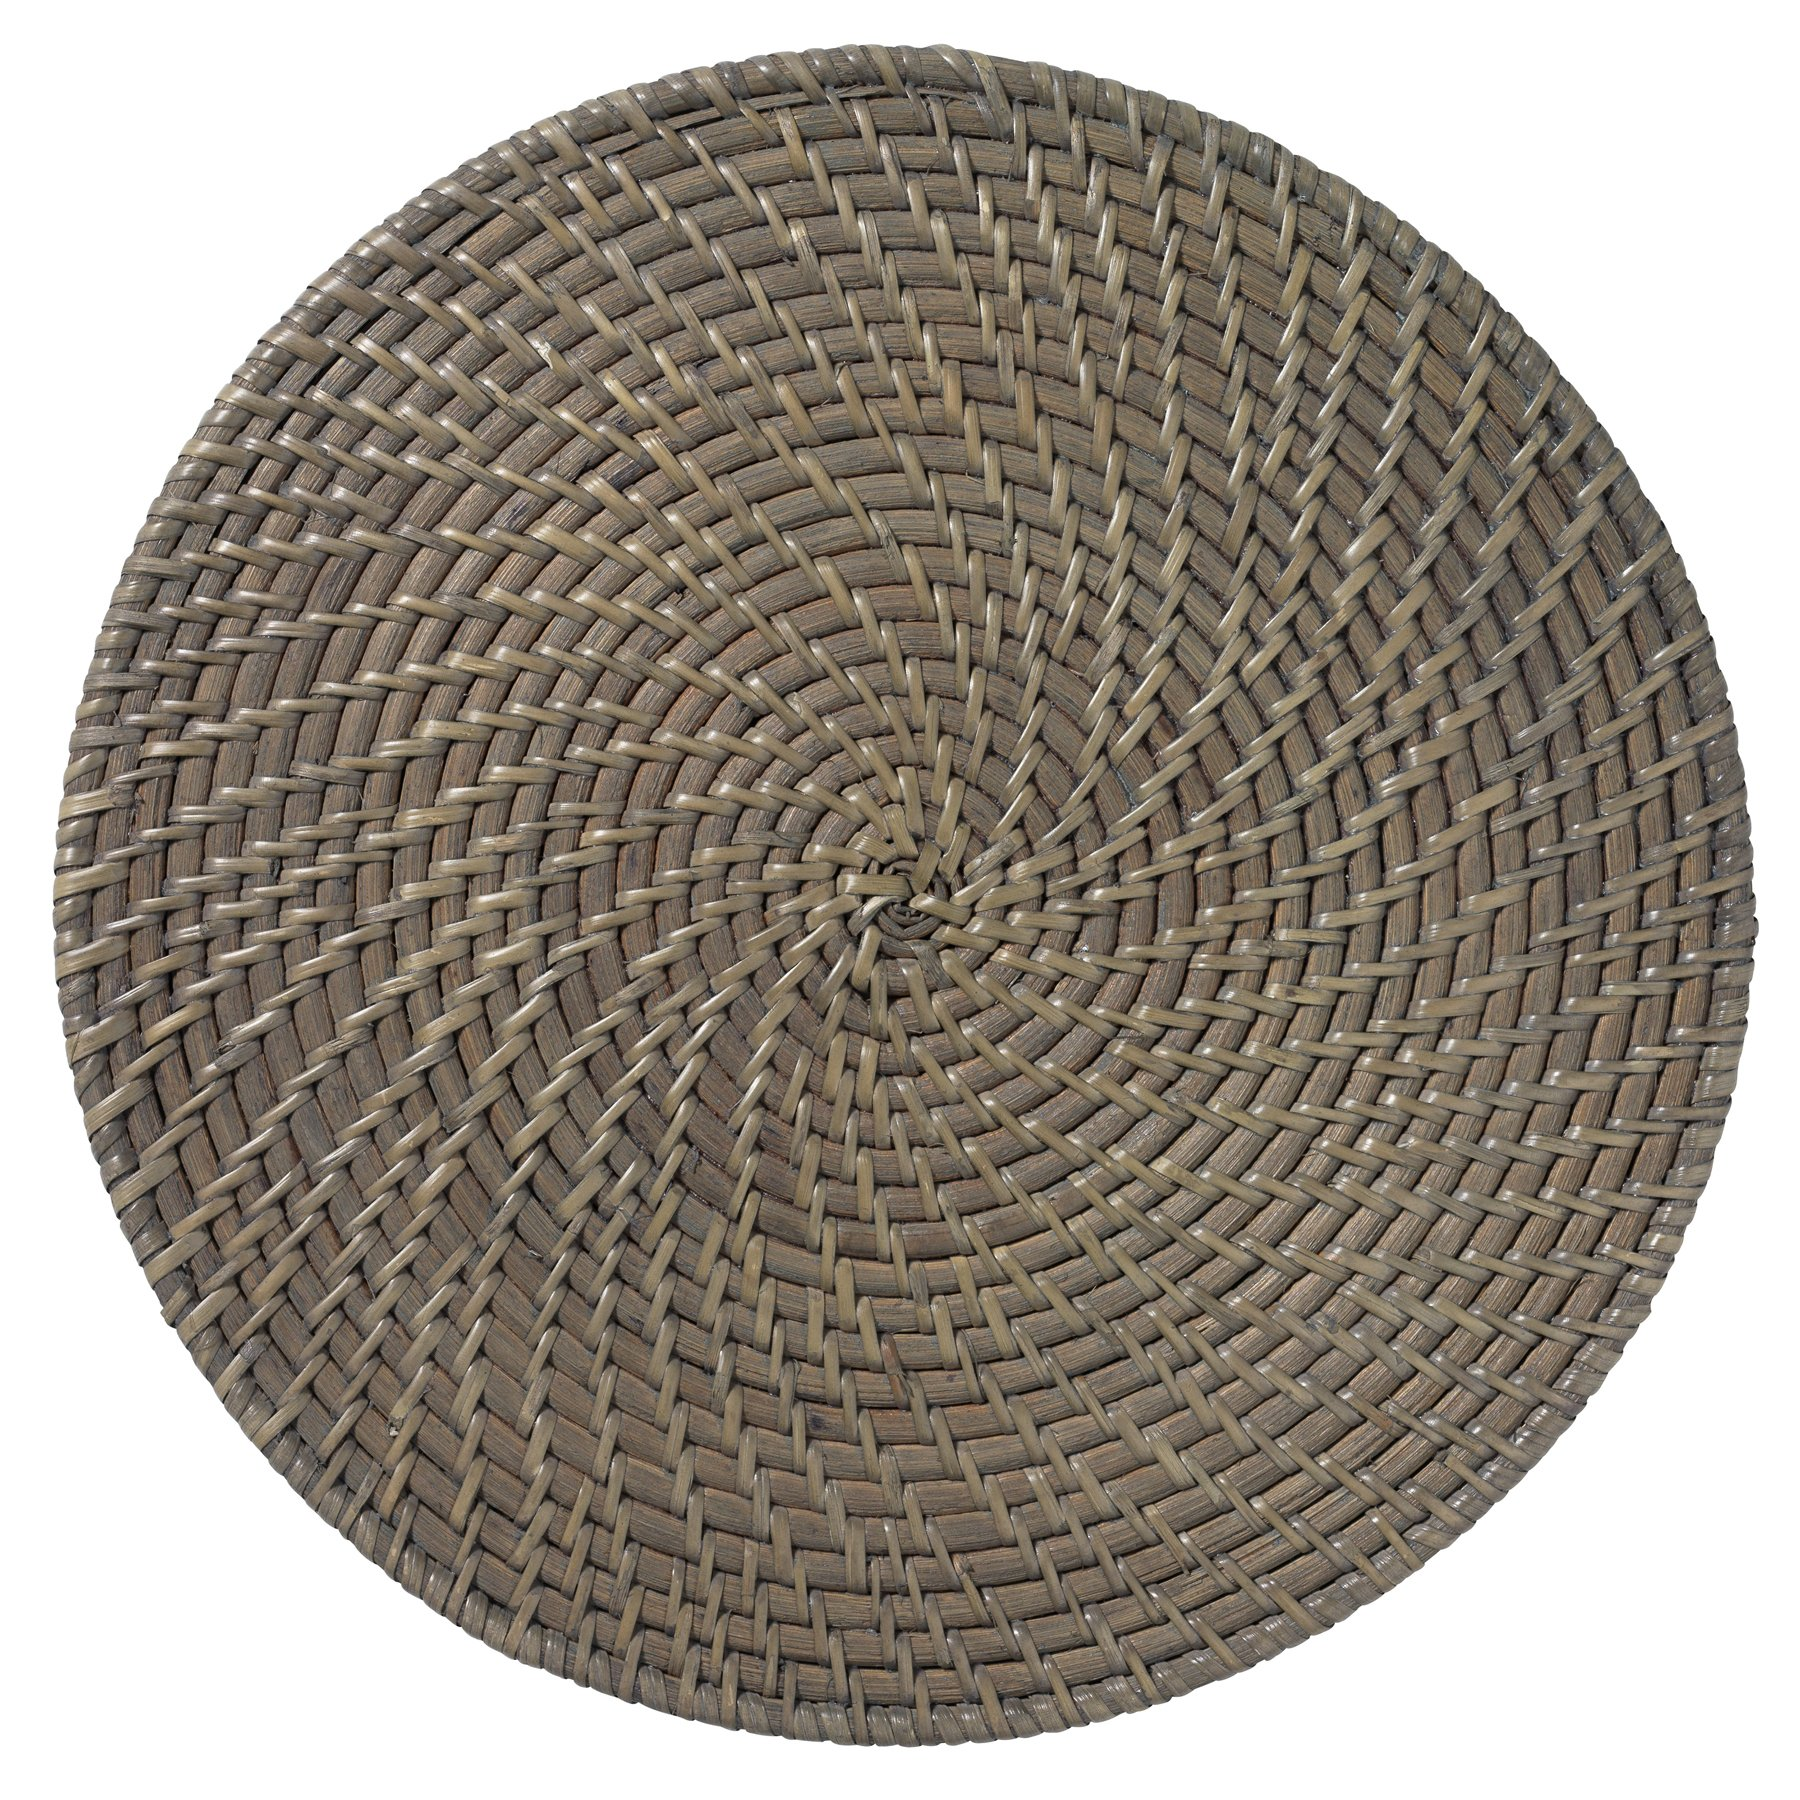 Merritt Rattan 14.5-inch Round Placemats, Set of 6, Gray